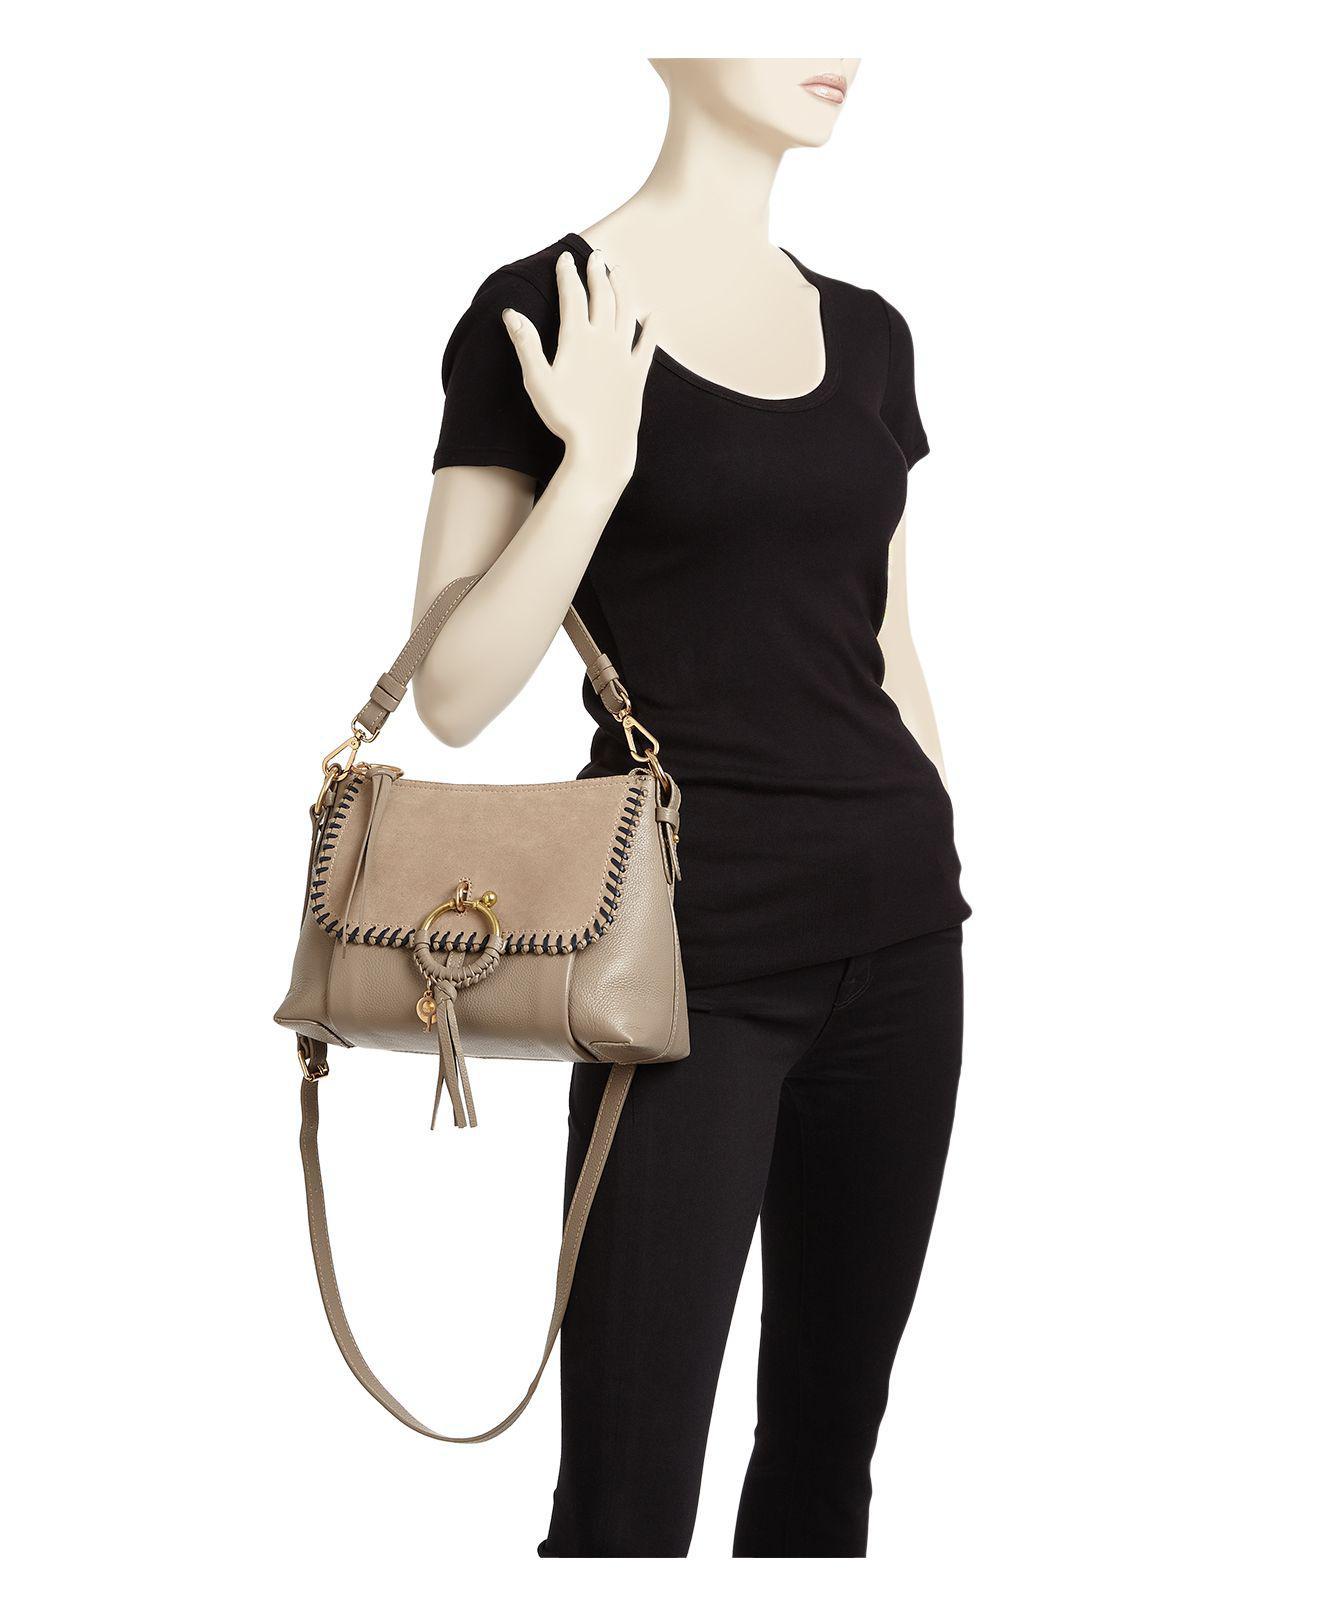 Satchel See Chloe Joan By Small Leather Bag mN8n0vw